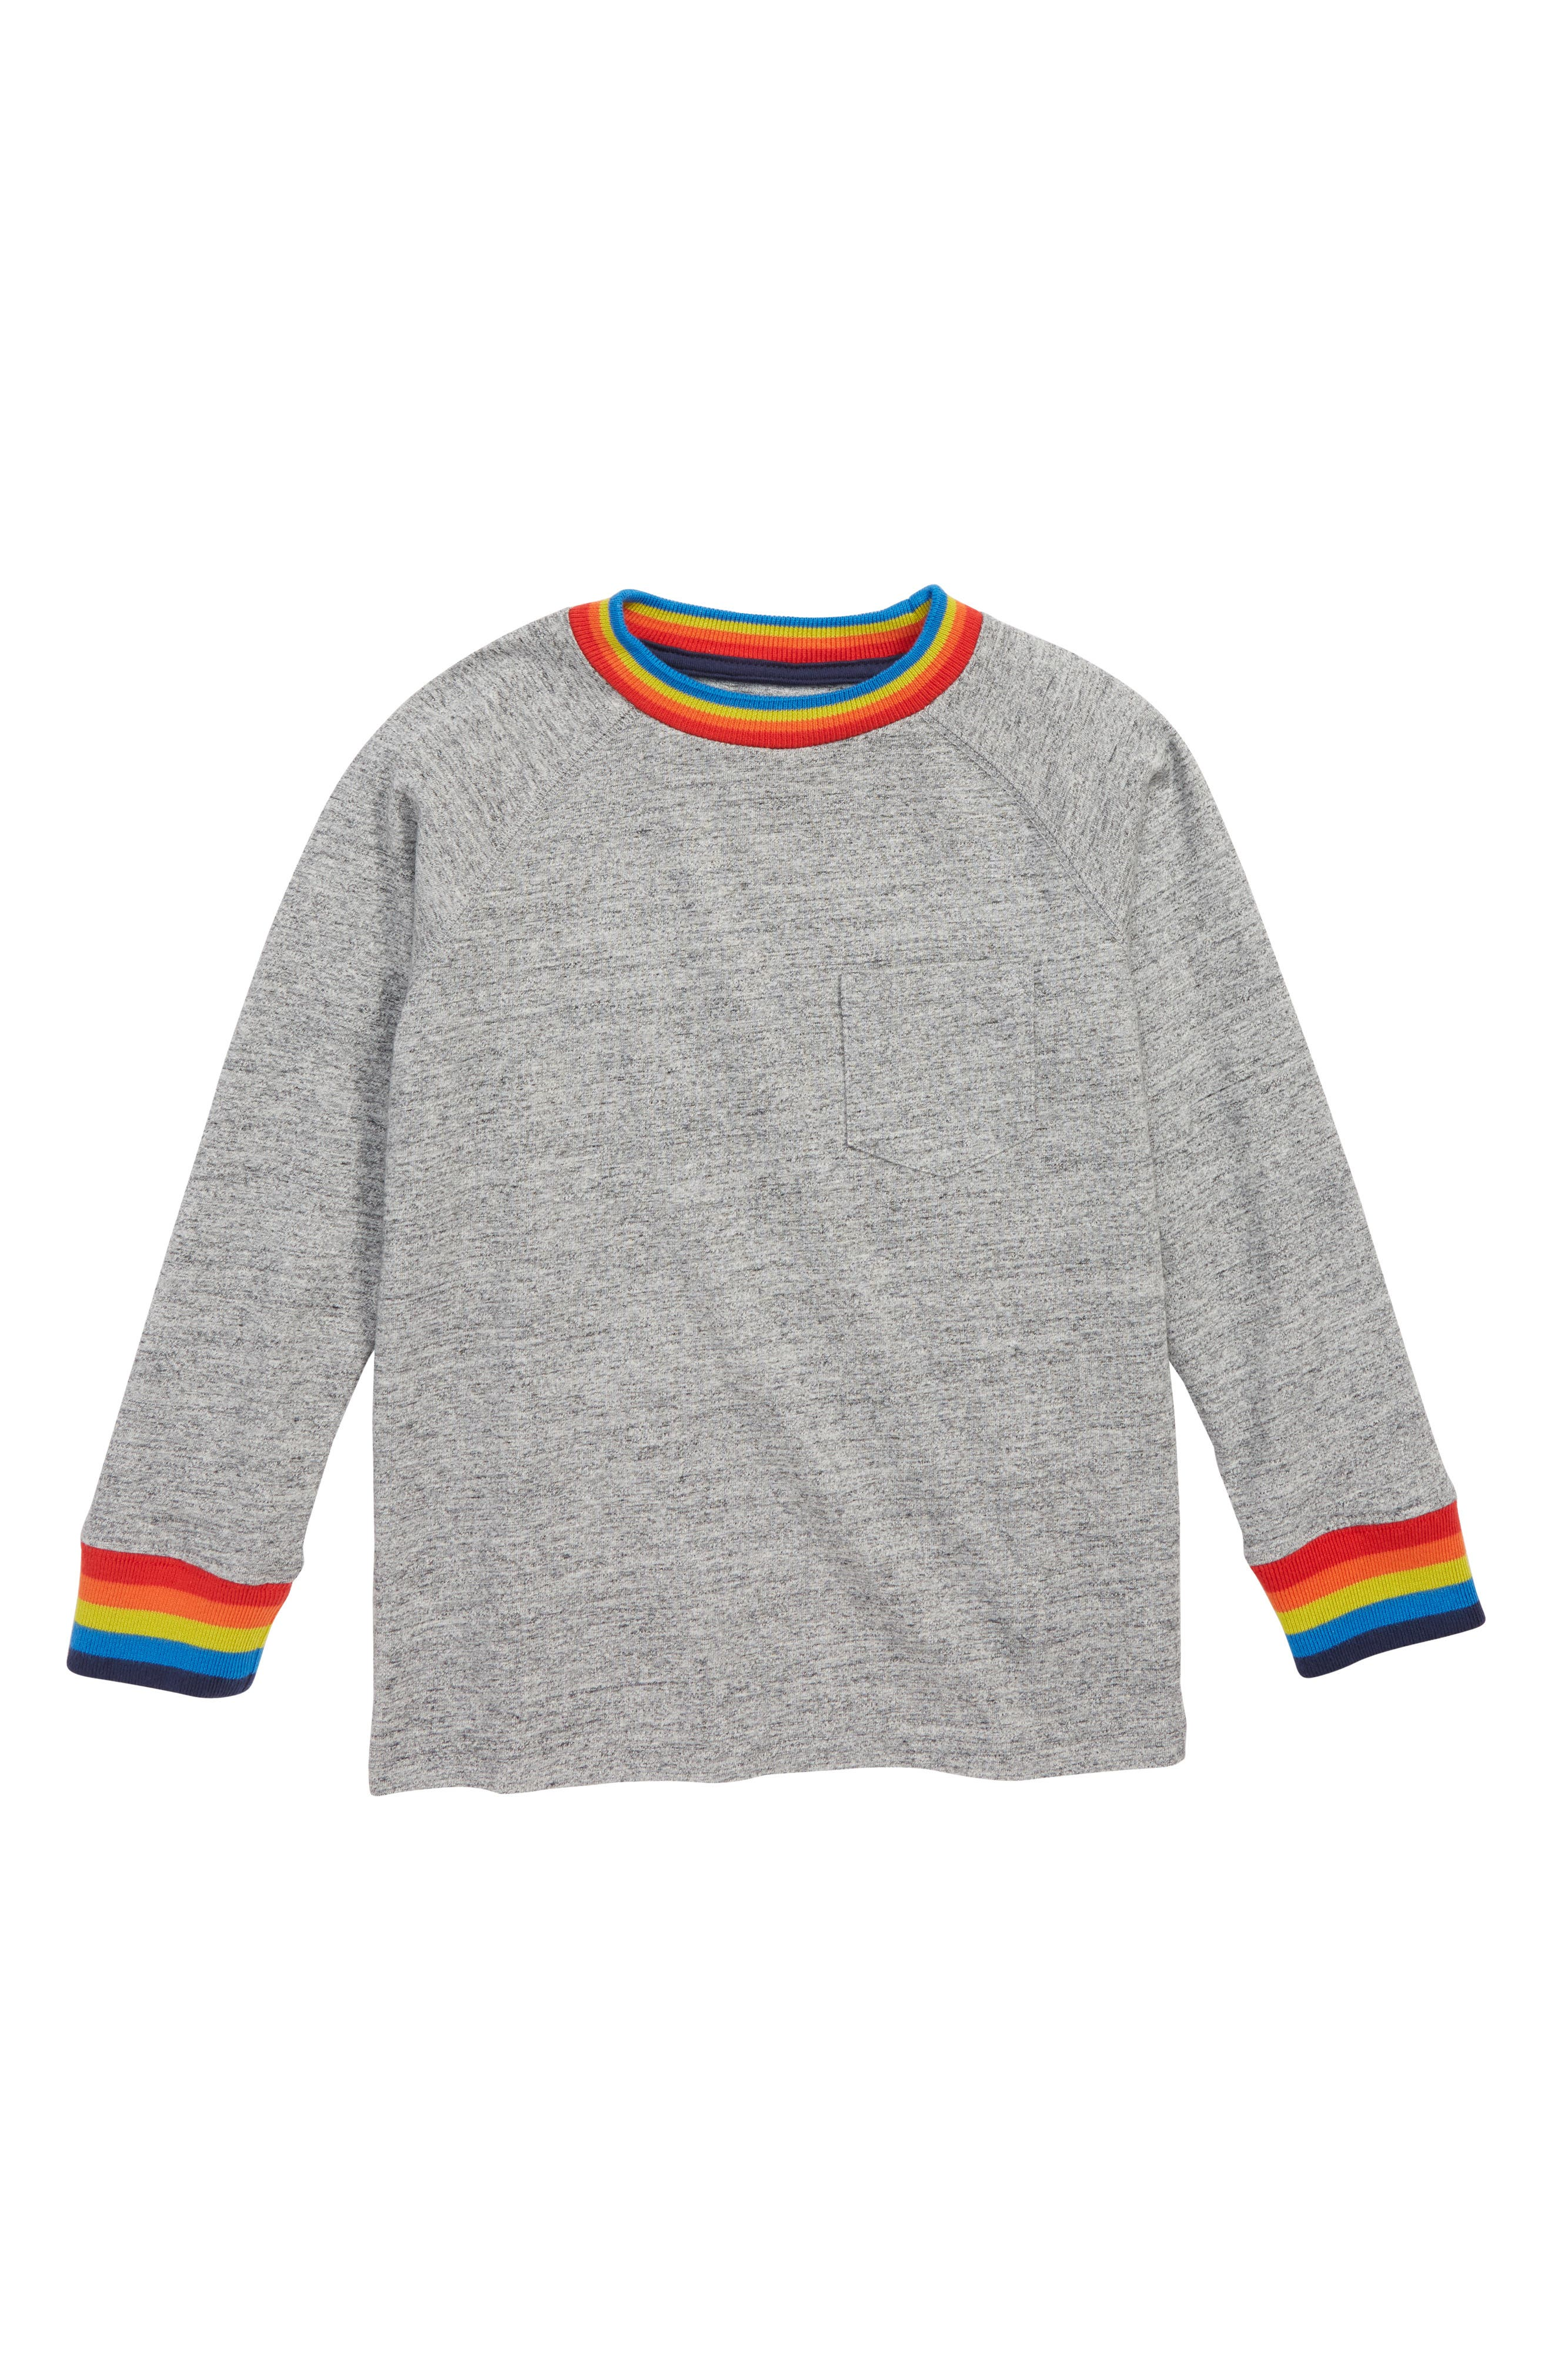 Stripe Raglan Sweatshirt,                             Main thumbnail 1, color,                             GREY MARL JASPE